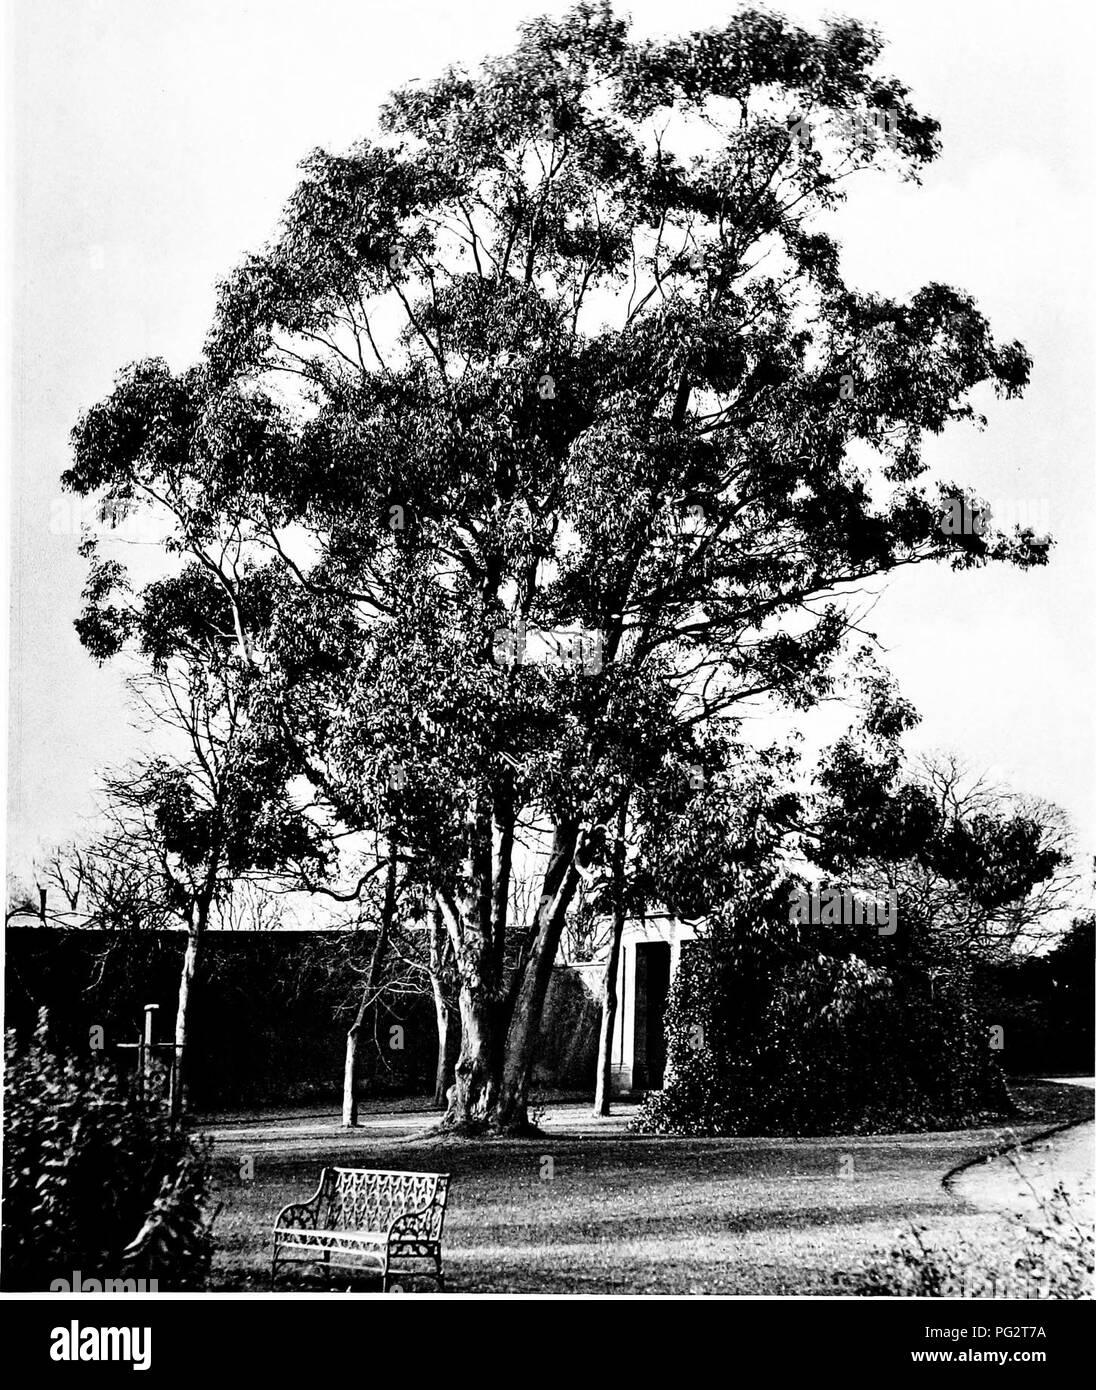 e4ecaeddada0 . The trees of Great Britain   Ireland. Trees  Trees. EUCALYPTUS  WHITTINGEHAMENSIS AT WHITTINGEHAME Plai e 363.